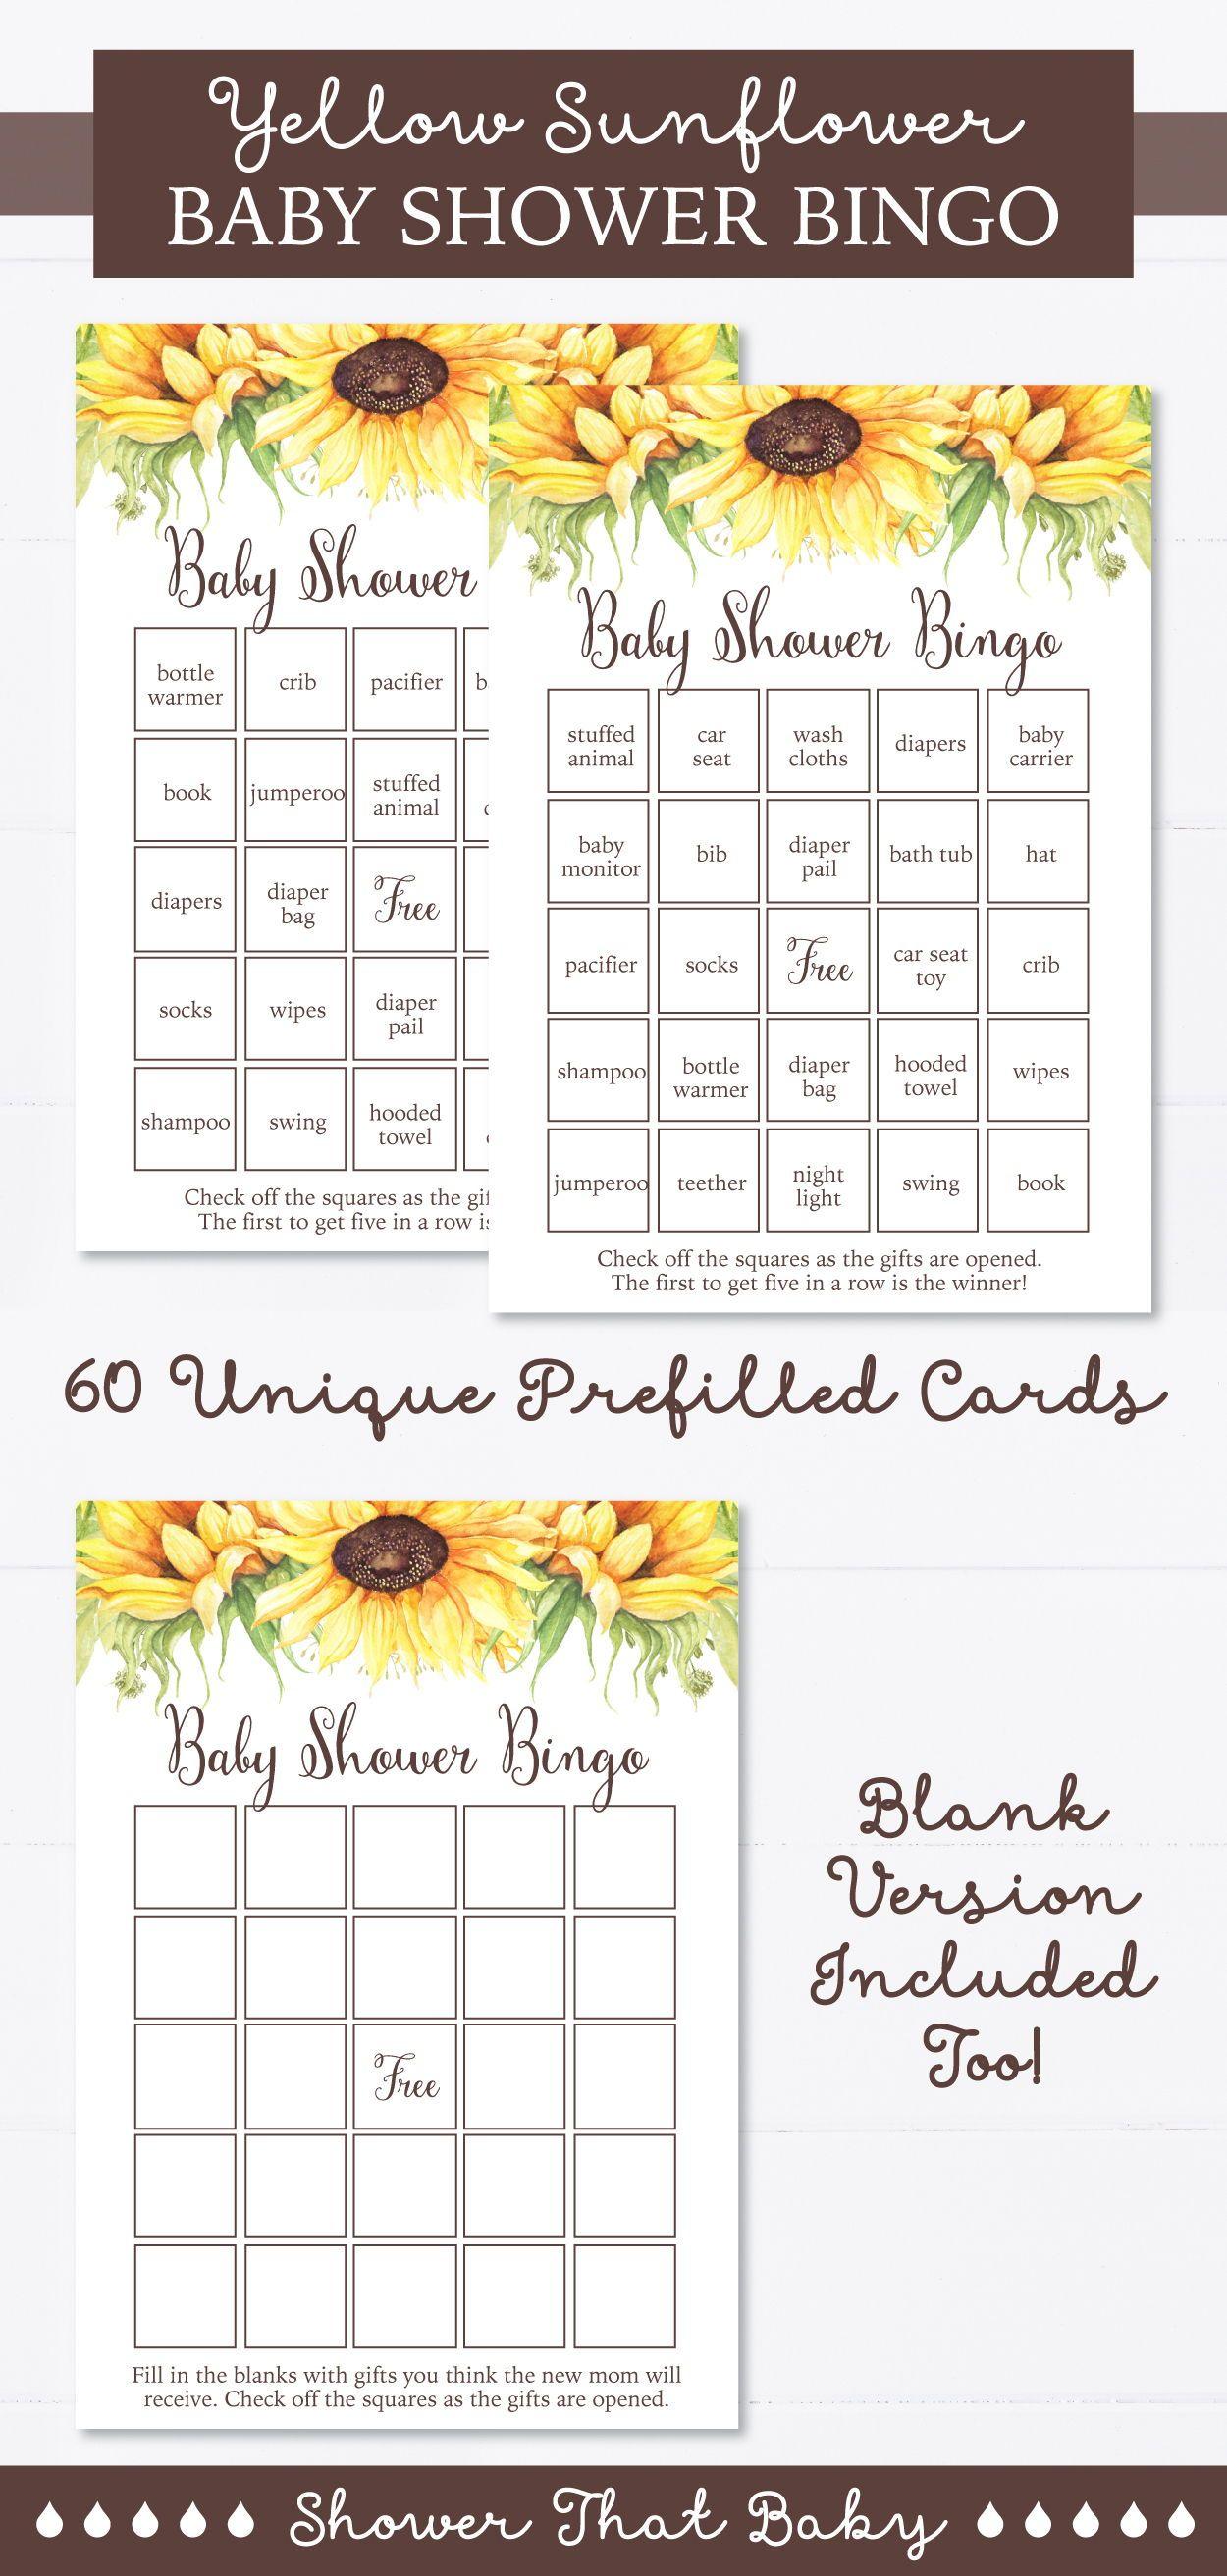 Sunflower Baby Shower Bingo Cards Printable Blank Bingo Etsy In 2020 Sunflower Baby Showers Summer Baby Shower Baby Shower Bingo